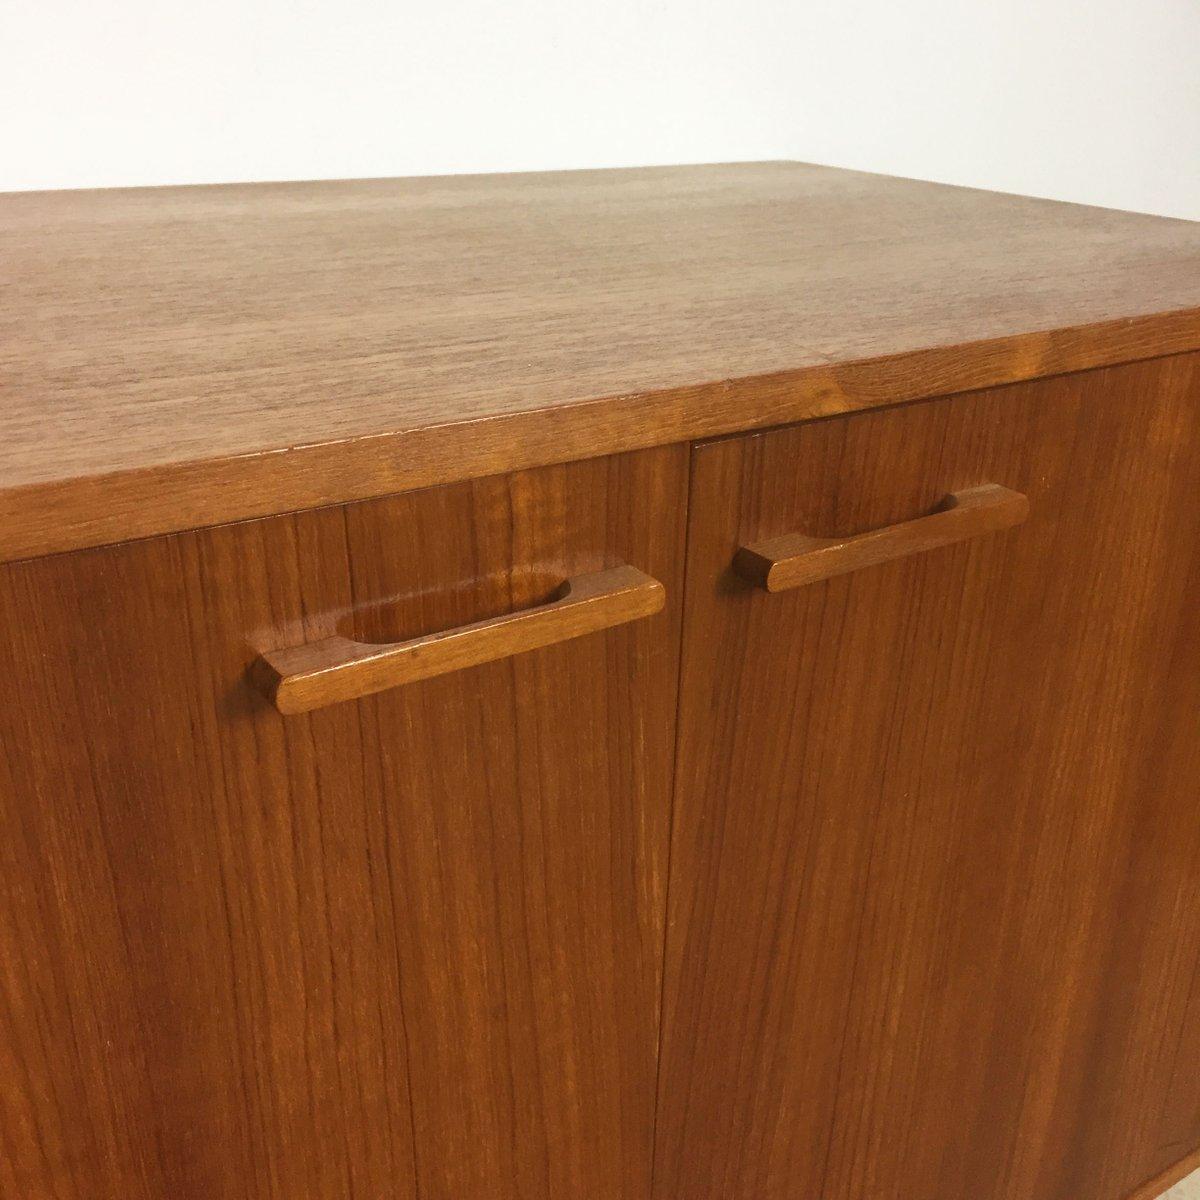 Teak cabinets by kai kristiansen for feldballes for 1960 kitchen cabinets for sale